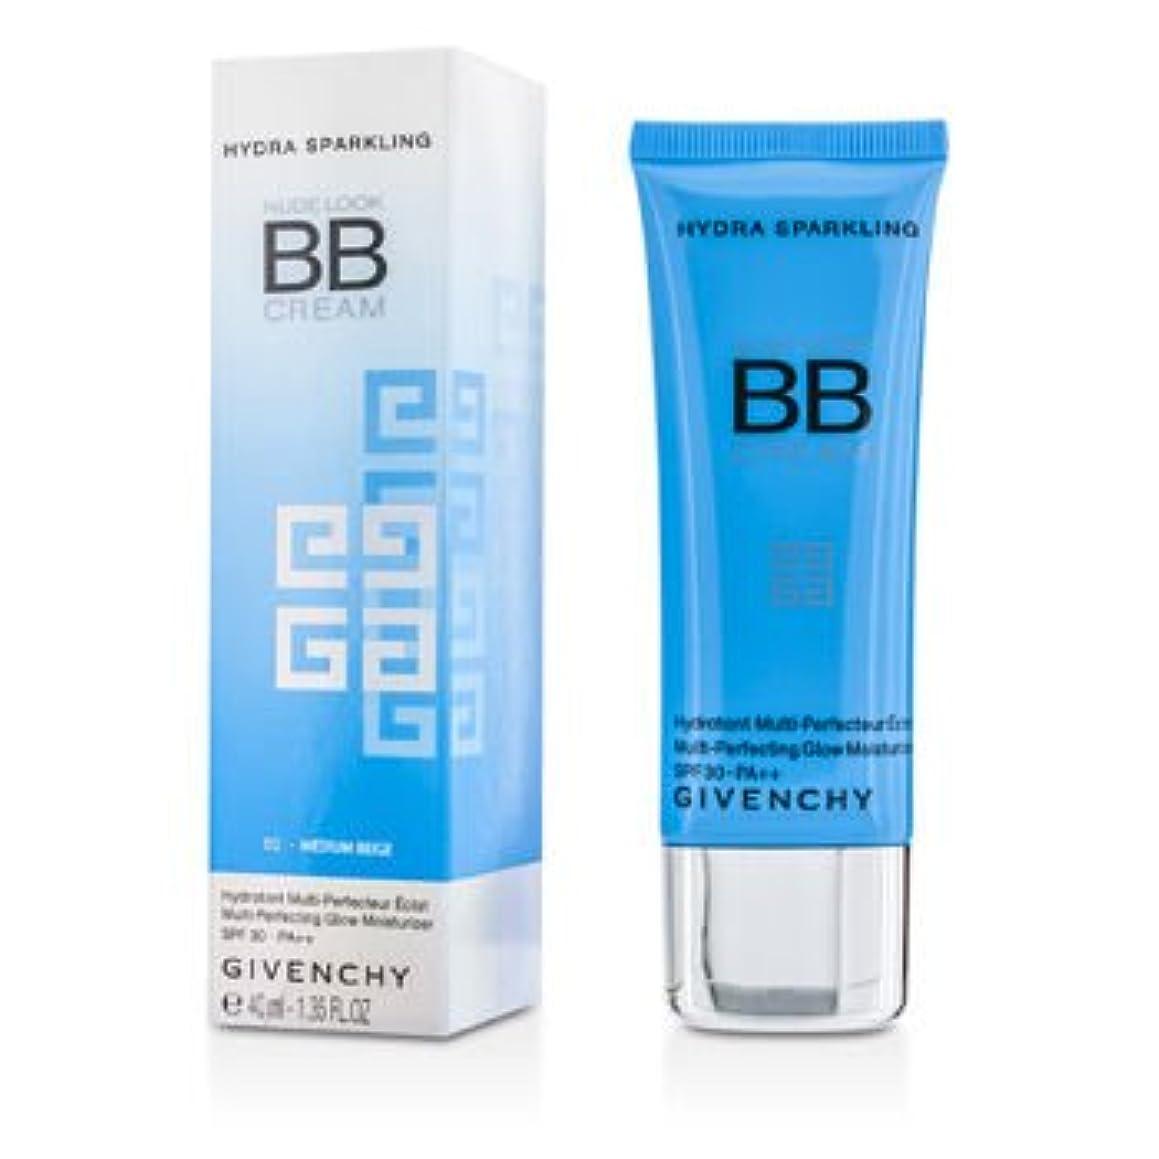 底百科事典改革[Givenchy] Nude Look BB Cream Multi-Perfecting Glow Moisturizer SPF 30 PA++ #02 Medium Beige 40ml/1.35oz